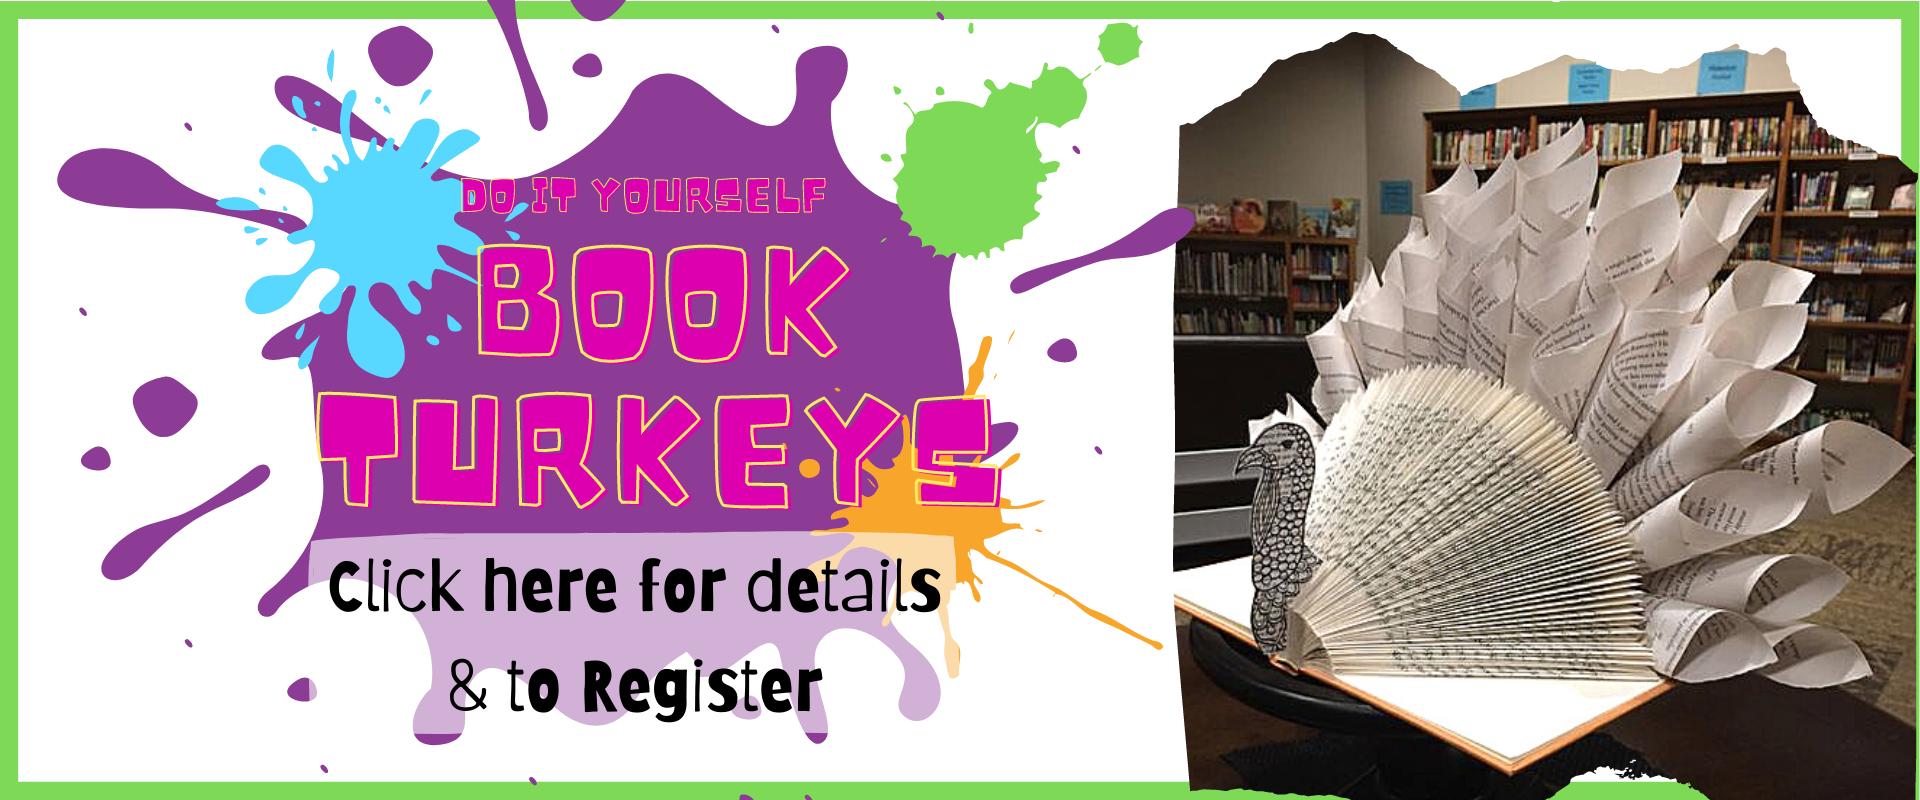 Book Turkeys Take-And Make Website.png